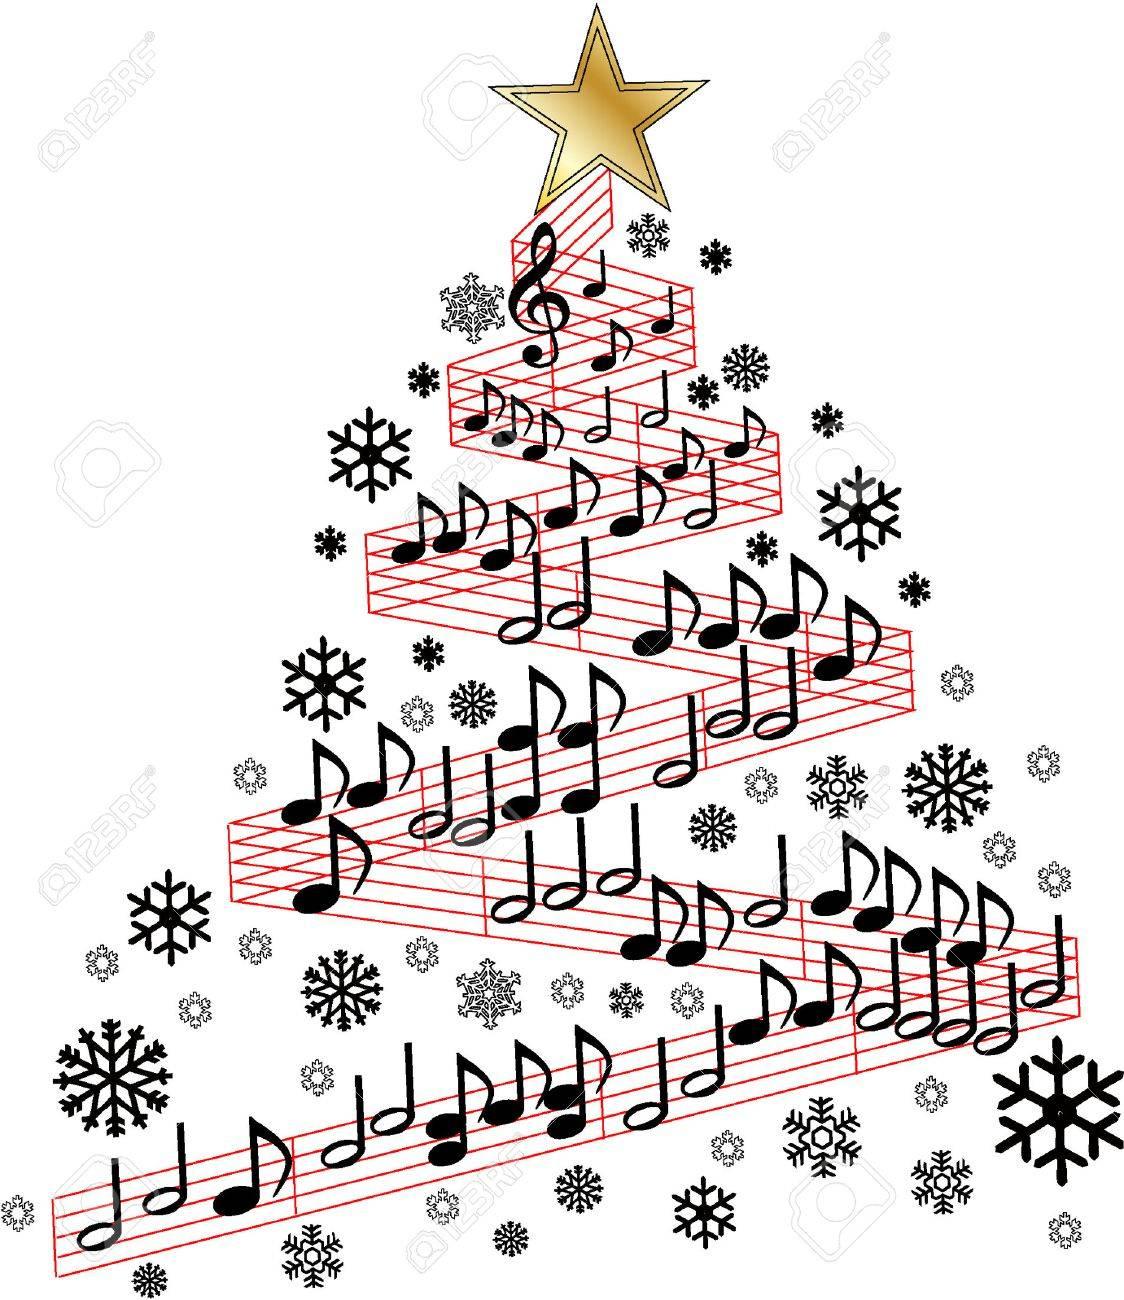 Free Christmas Music.Christmas Music Tree